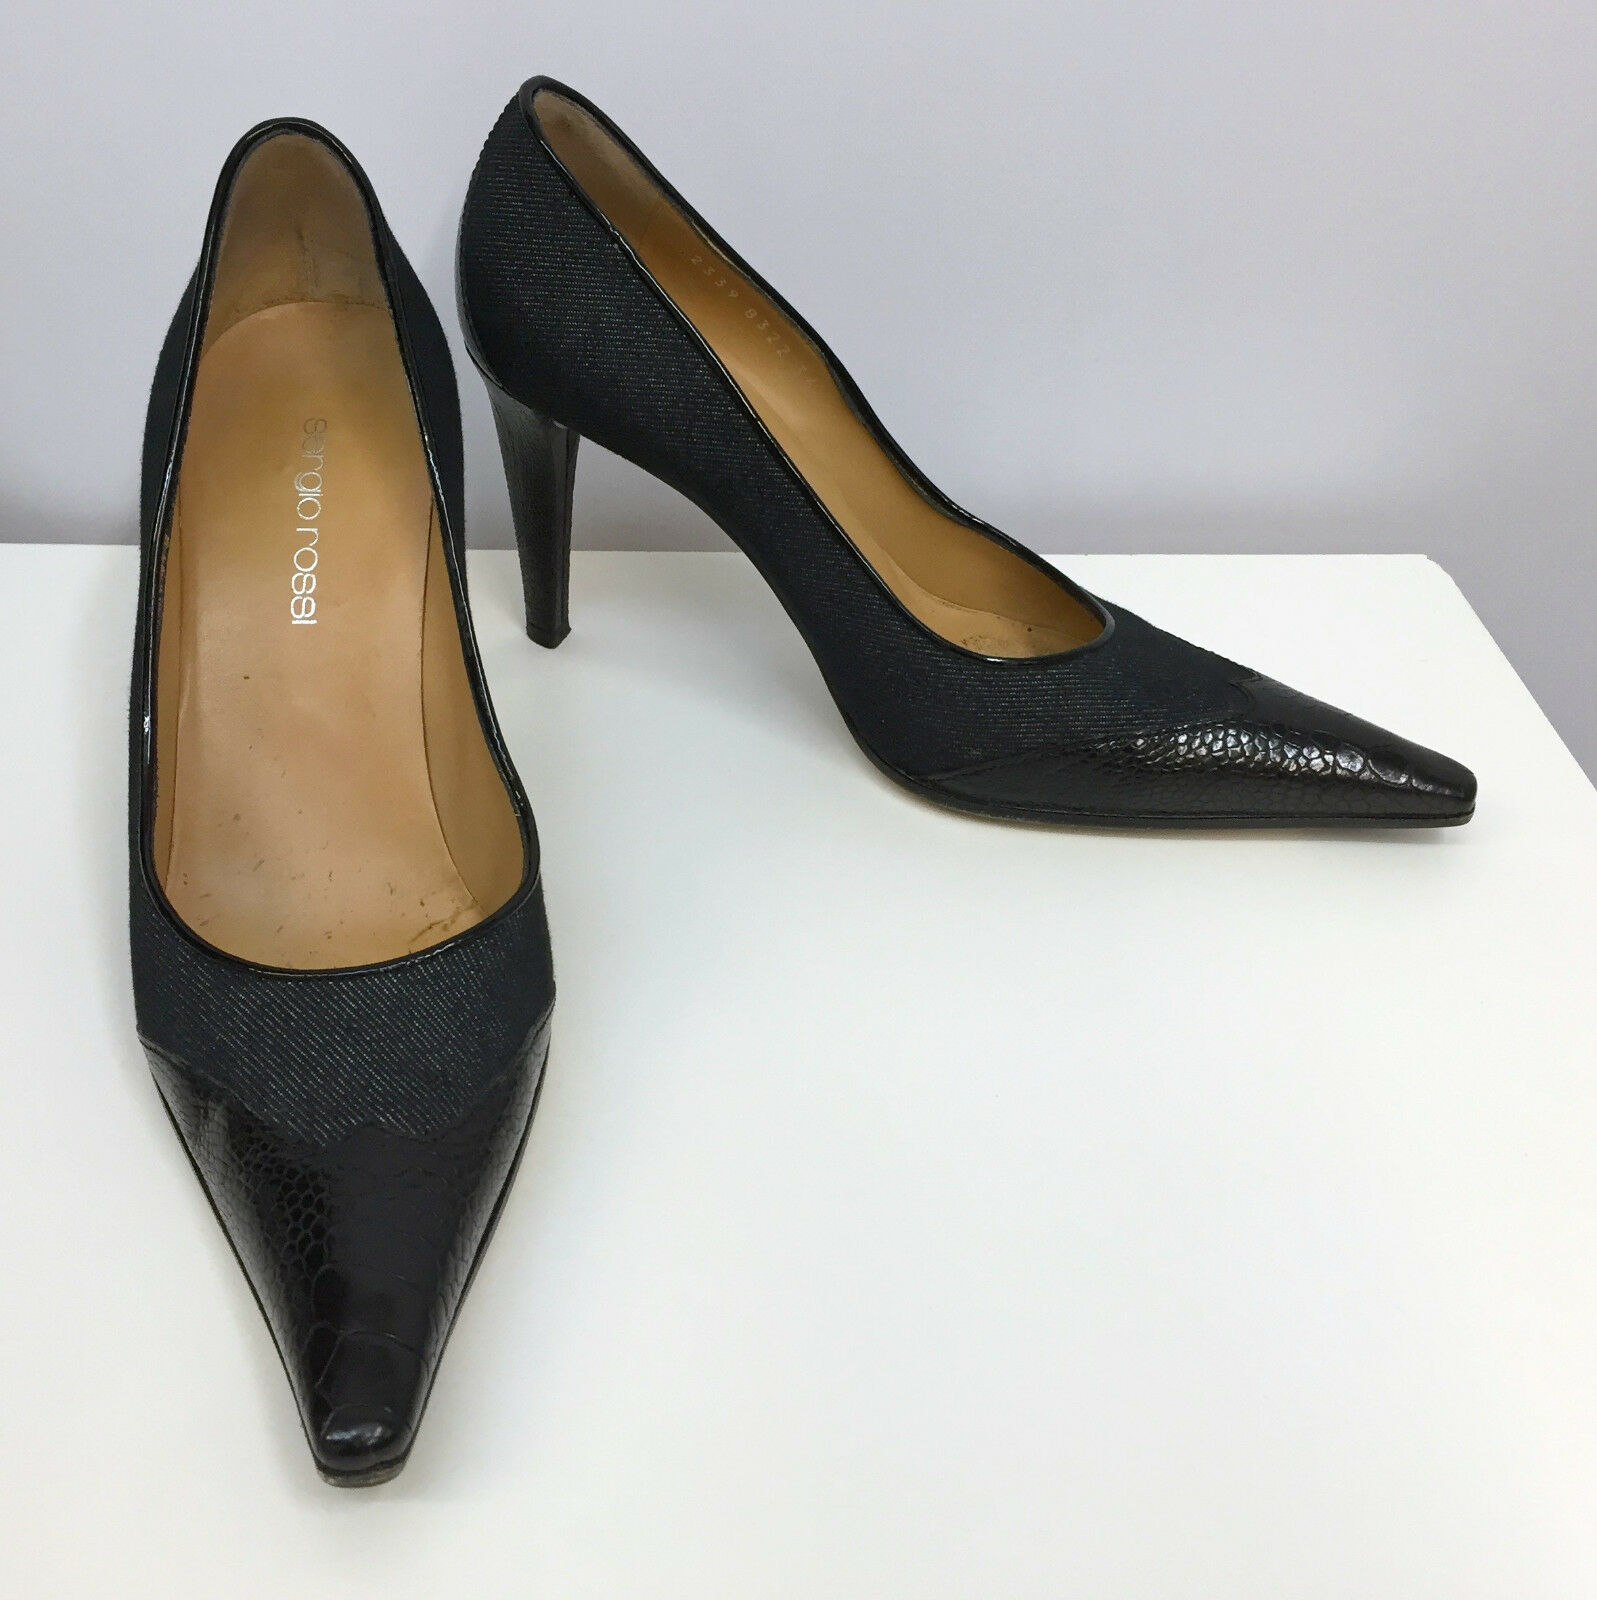 SERGIO ROSSI scarpe nero DENIM & OSTRICH LEG SEXY AND HIGH QUALITY Dimensione 36